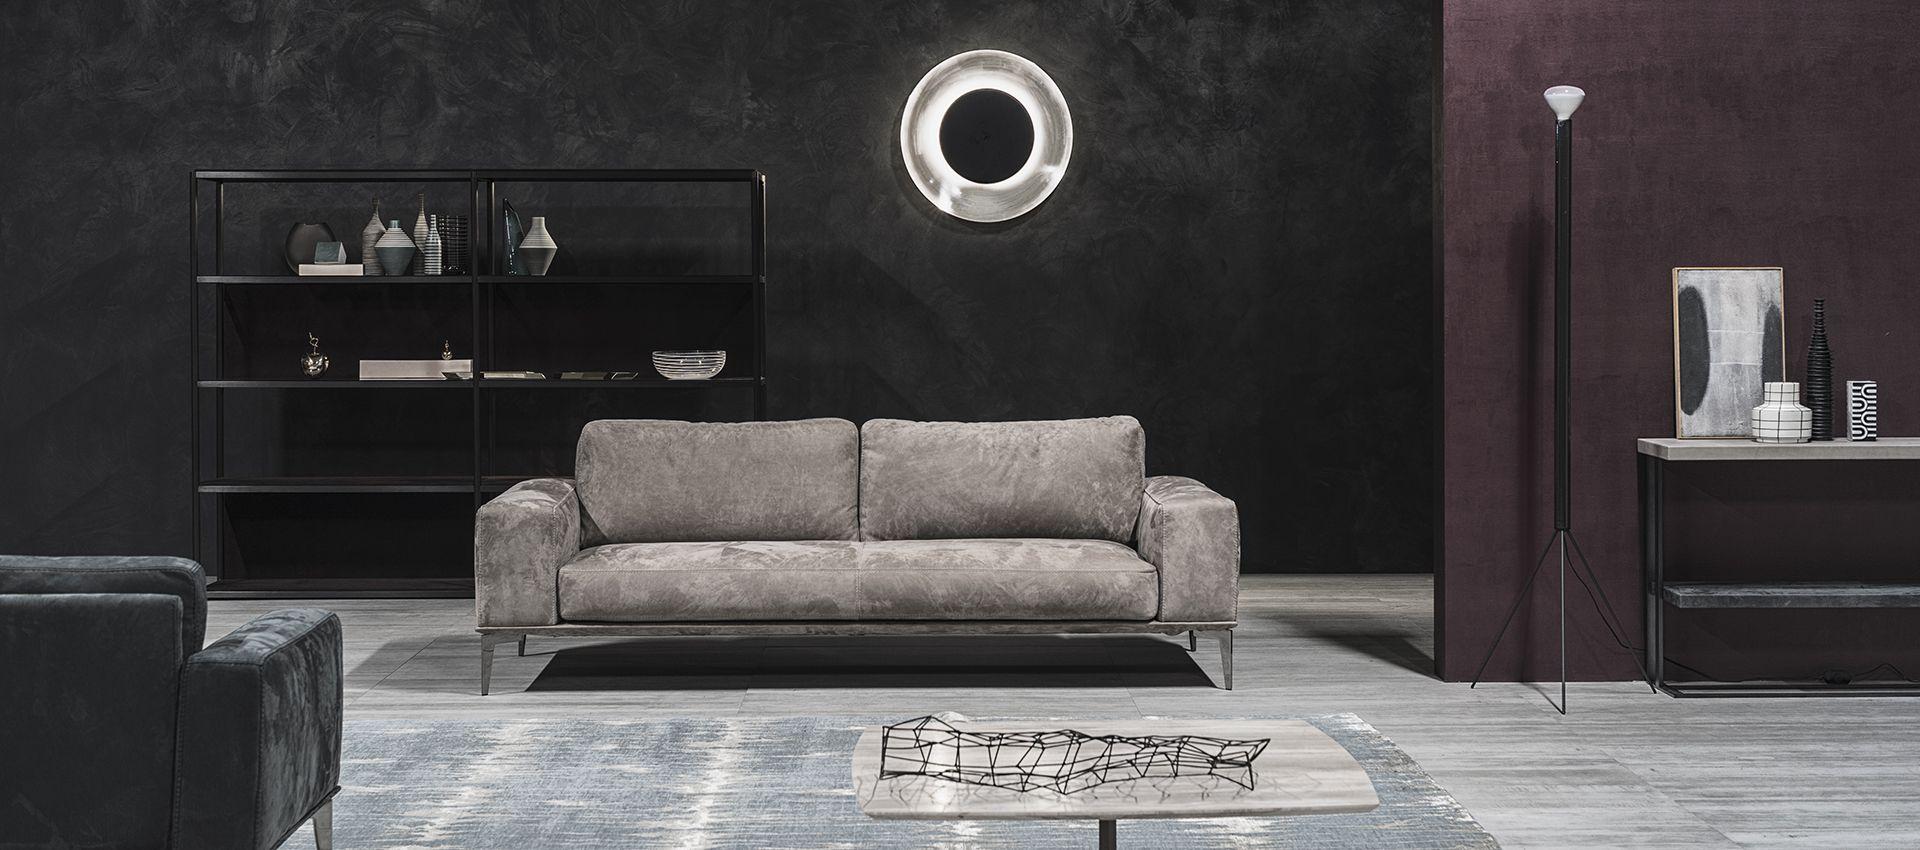 Strak Design Bank.Bank Leder Design Lommers Strak Modern Interieur Minotti Jori B B